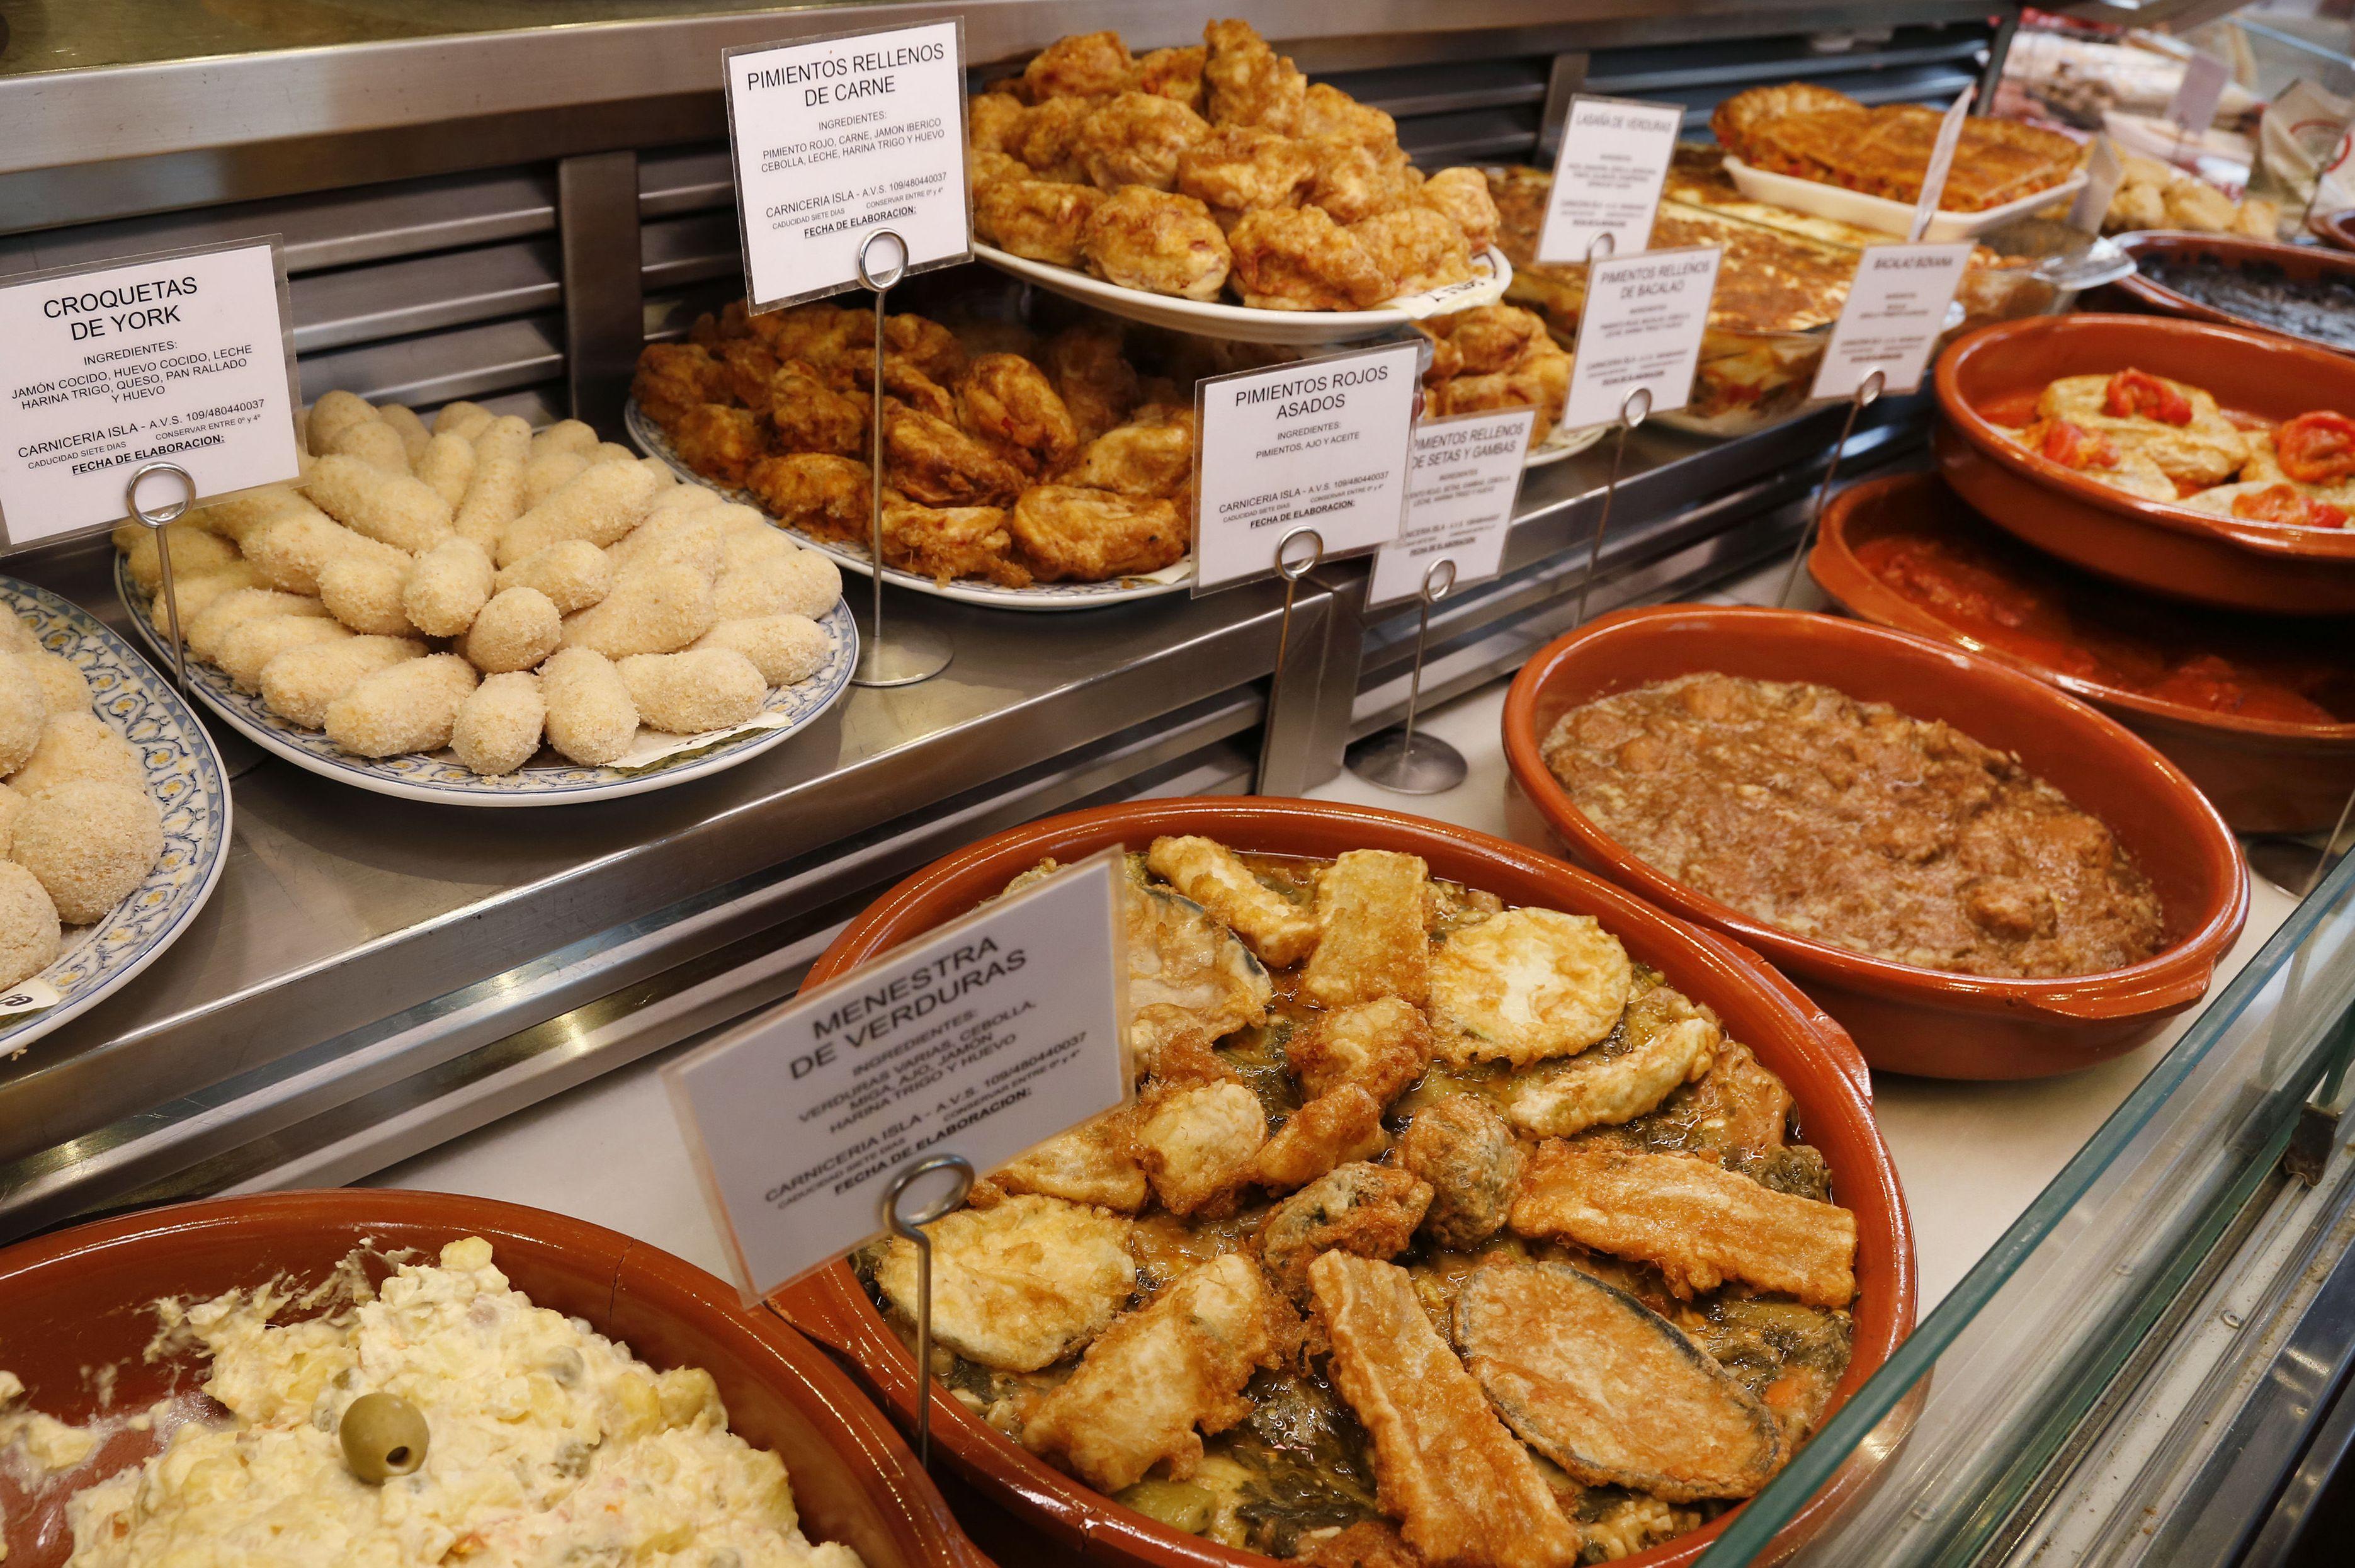 Comida preparada en Santa María de Gutxo